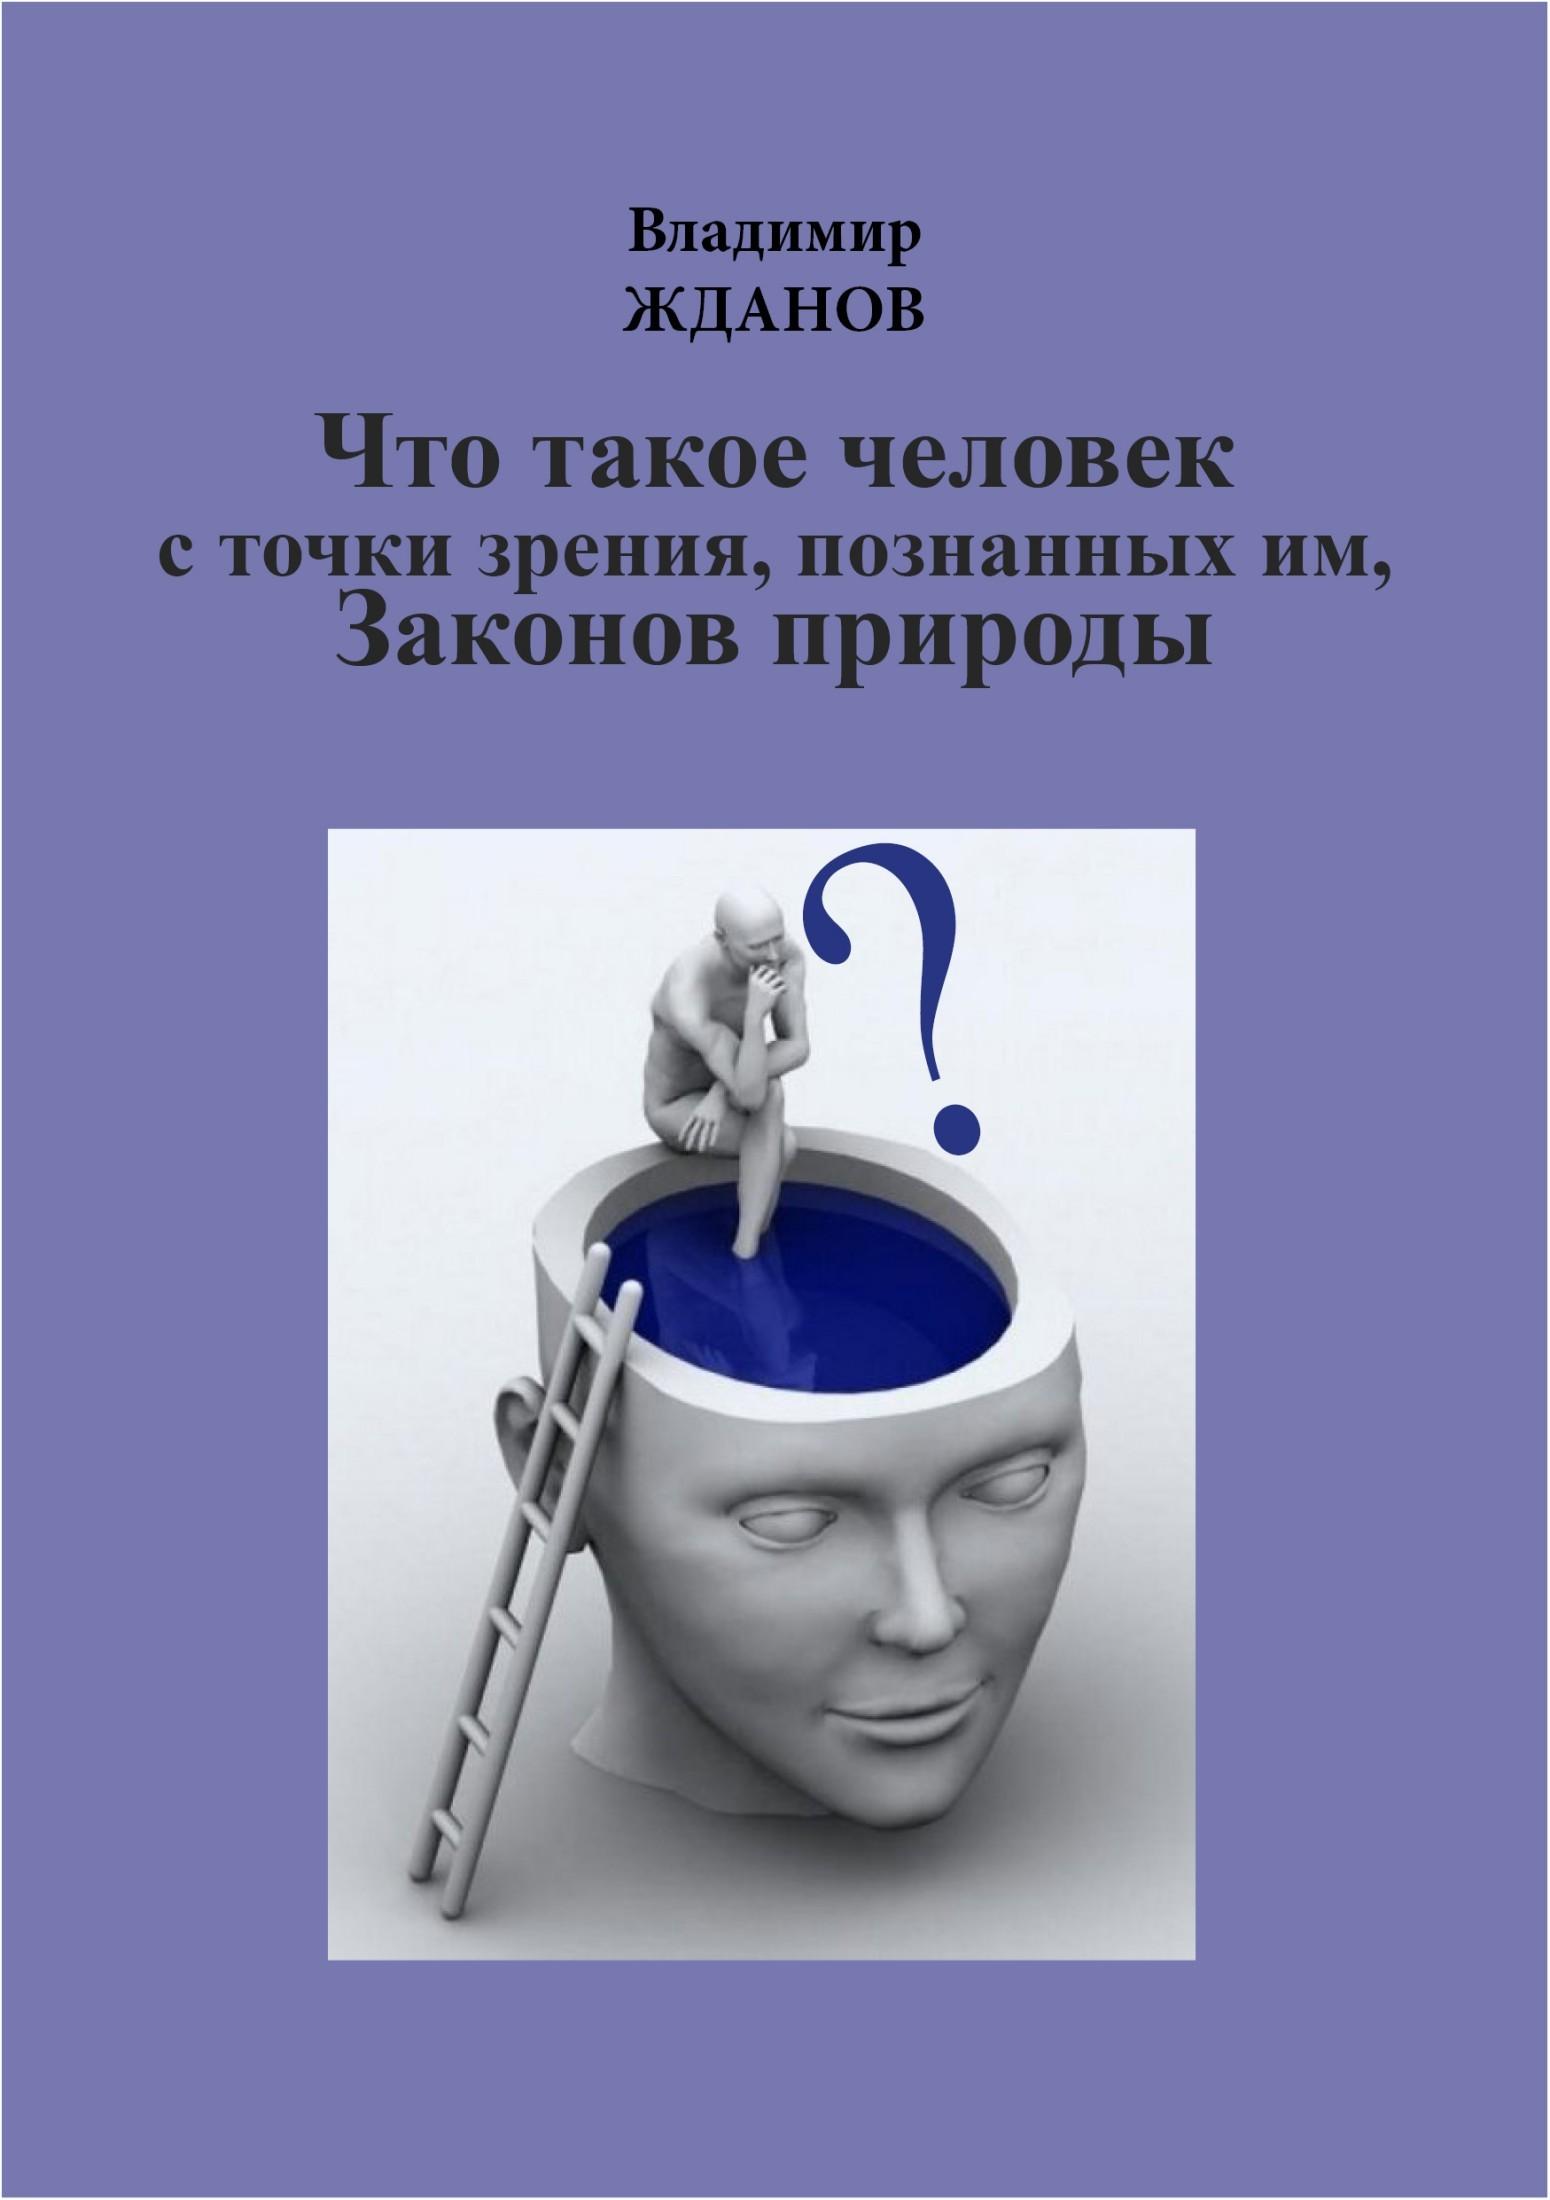 Владимир Степанович Жданов бесплатно